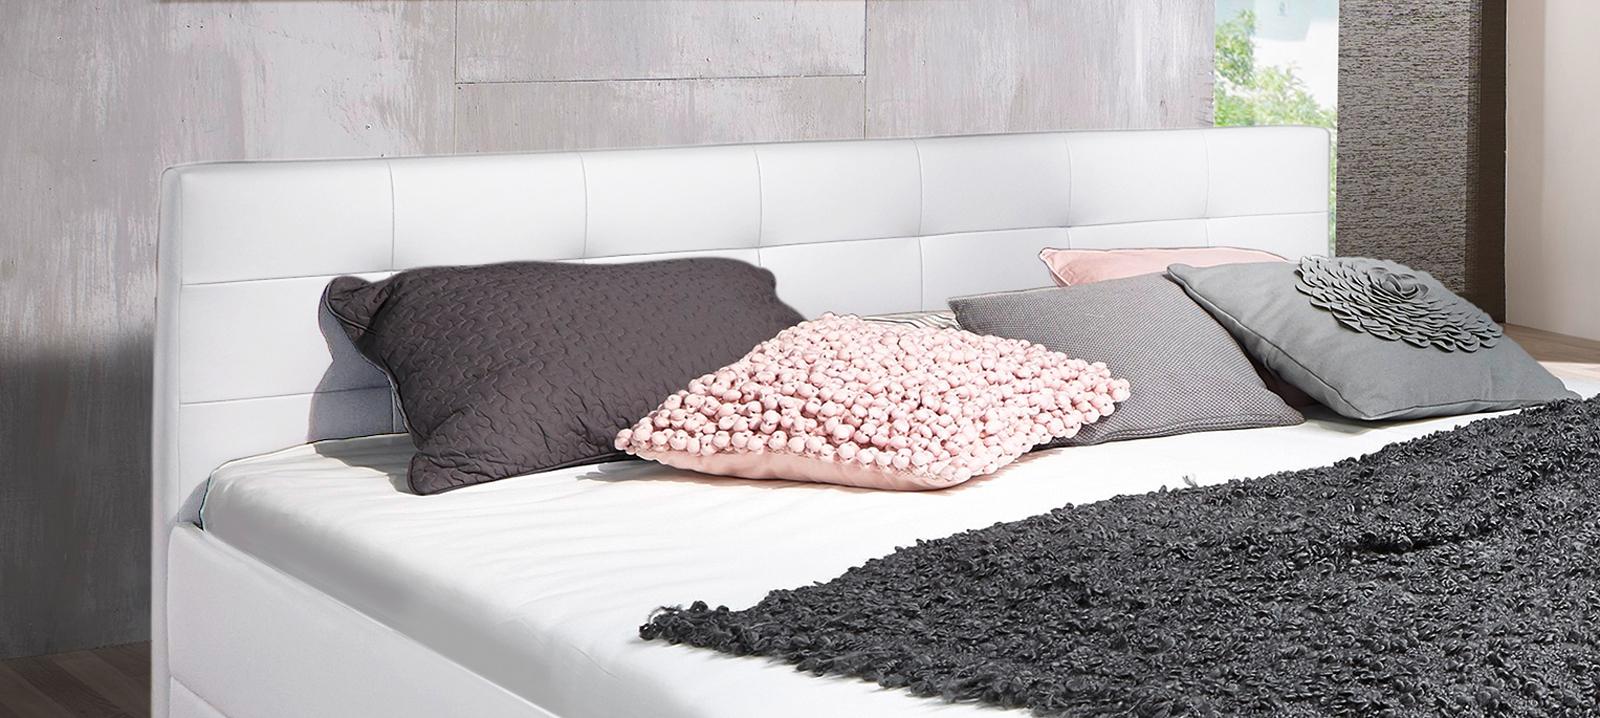 sam design polsterbett 140 x 200 cm wei kappa. Black Bedroom Furniture Sets. Home Design Ideas